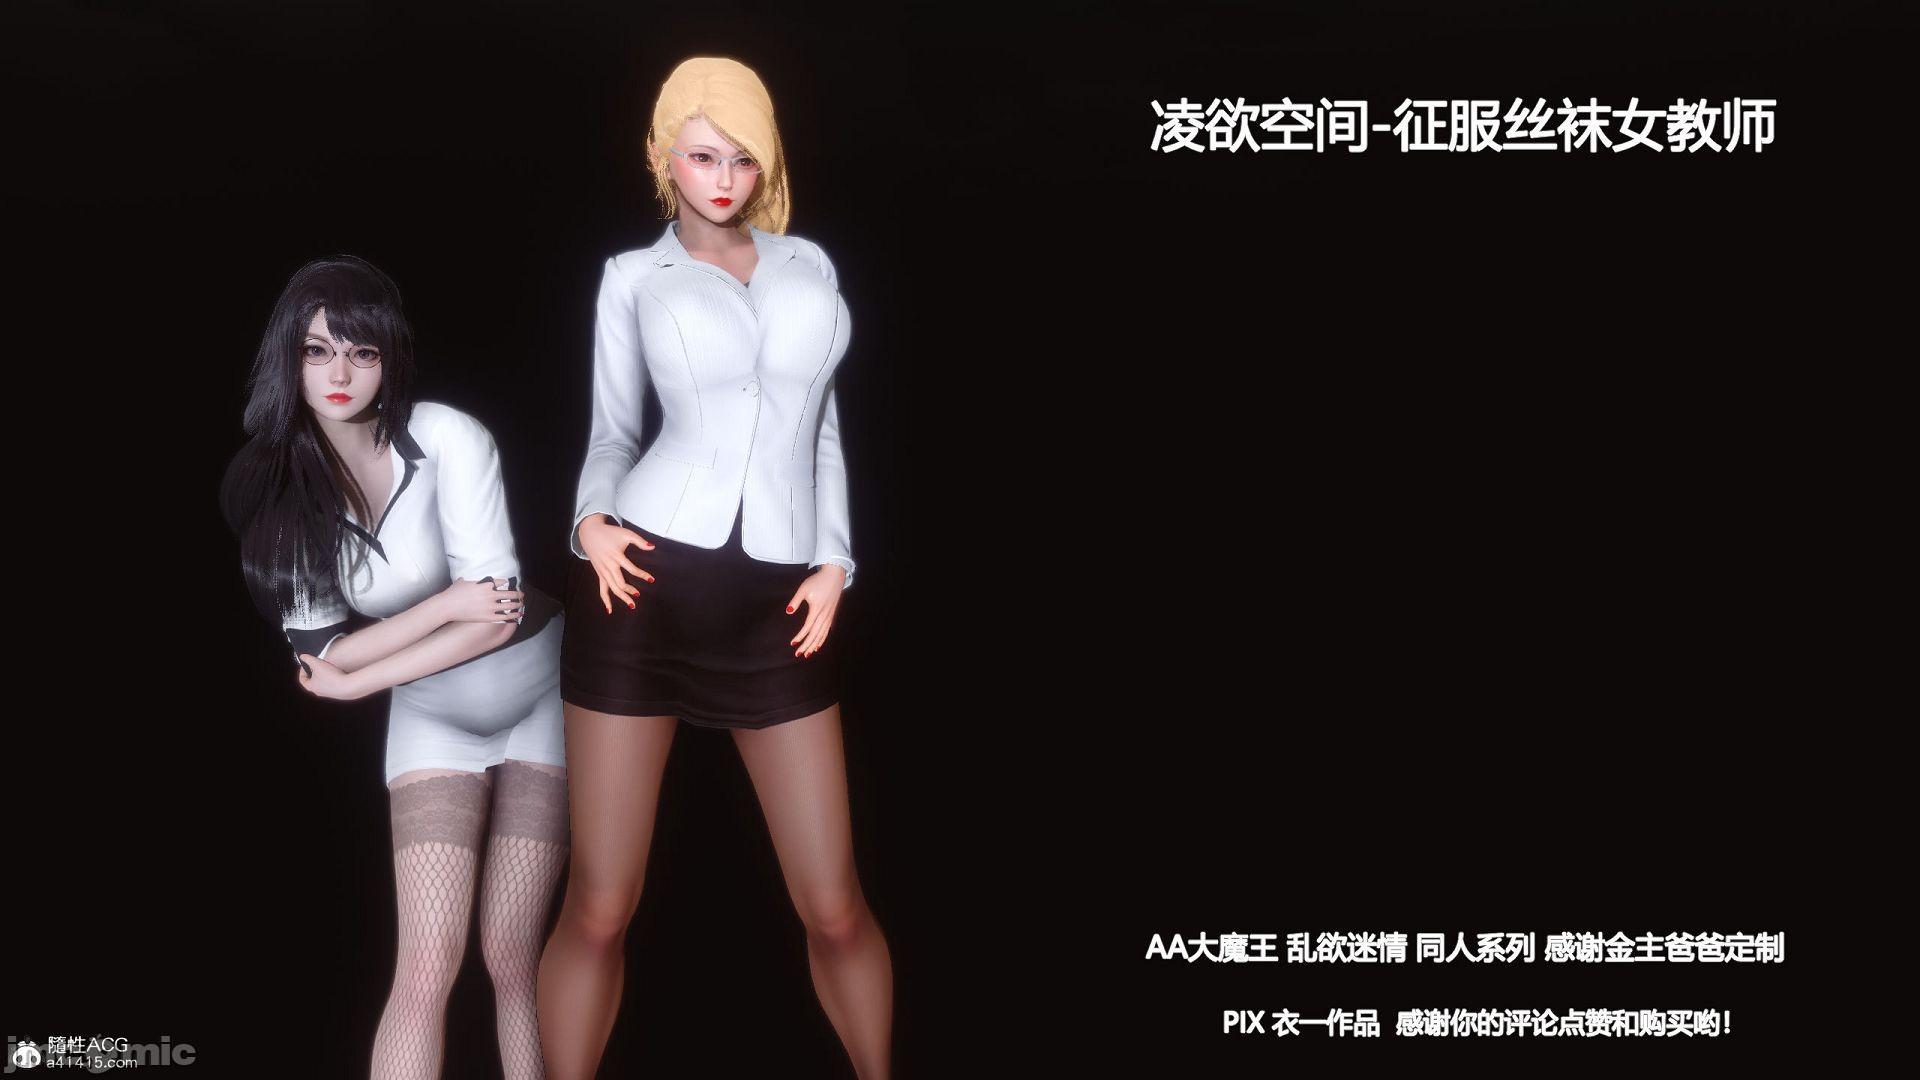 [3D]淩欲空間[完整版] 3(340P) - 情色卡漫 -